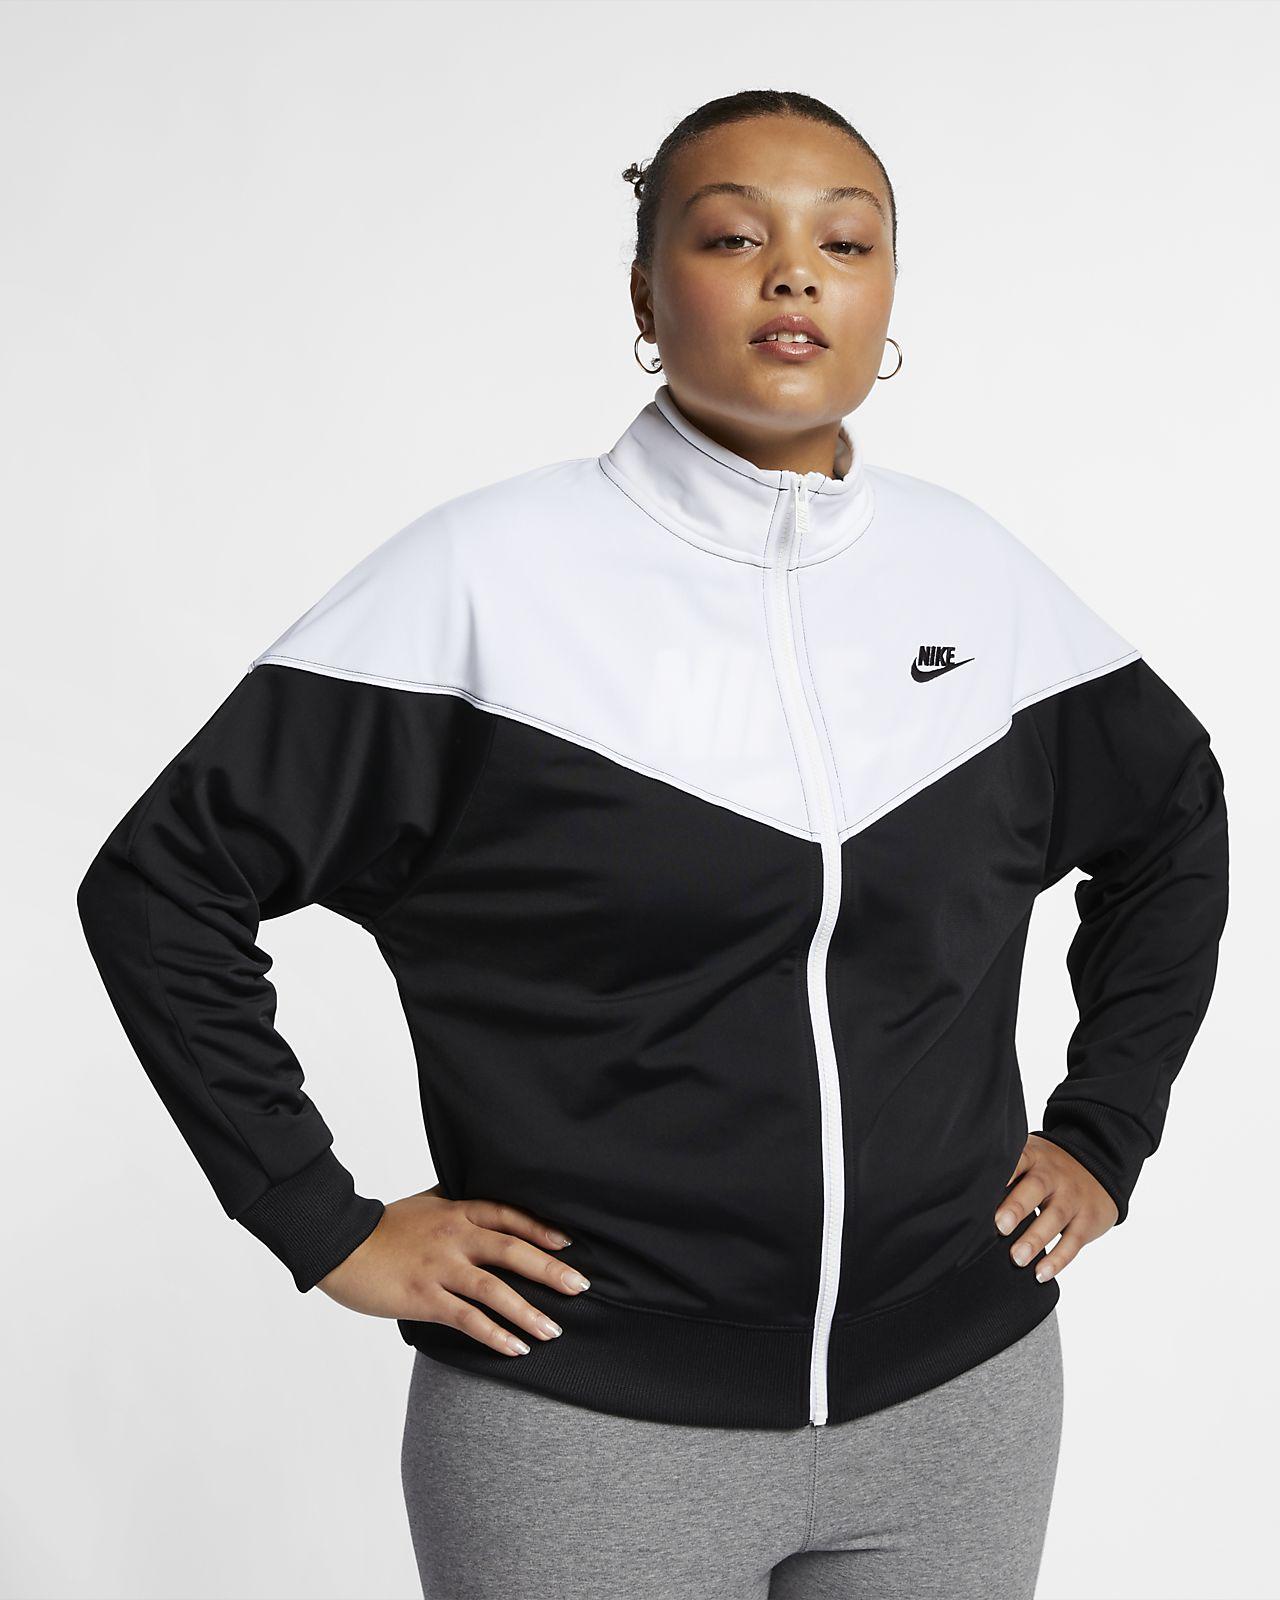 b4fbacf41c6 Nike Sportswear Heritage Women s Track Jacket (Plus Size). Nike.com